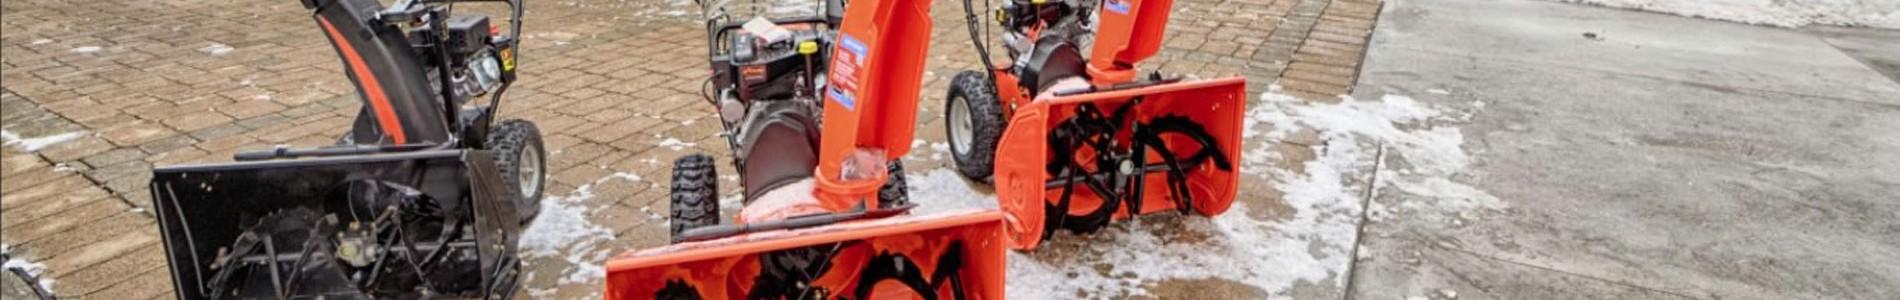 Snow Blower Equipment Snow Thrower Repair